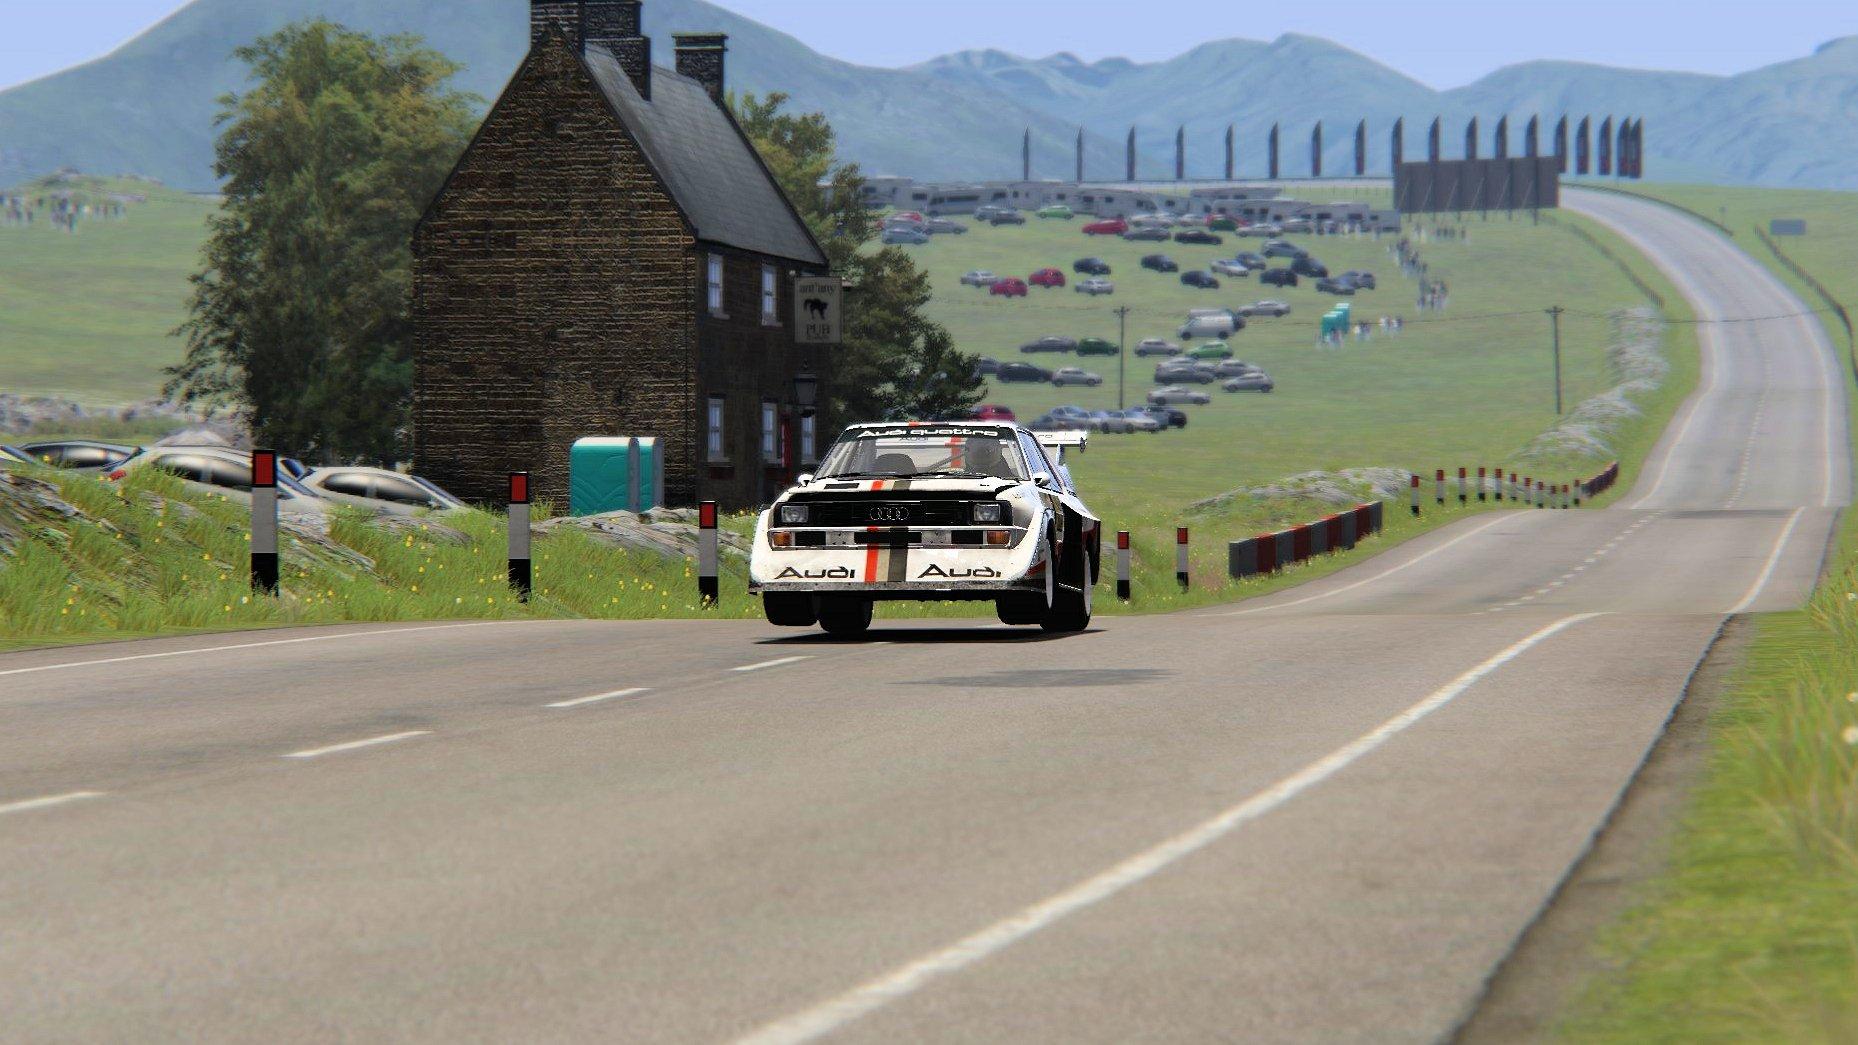 screenshot_ks_audi_sport_quattro_rally_ks_highlands_14-2-117-12-52-21